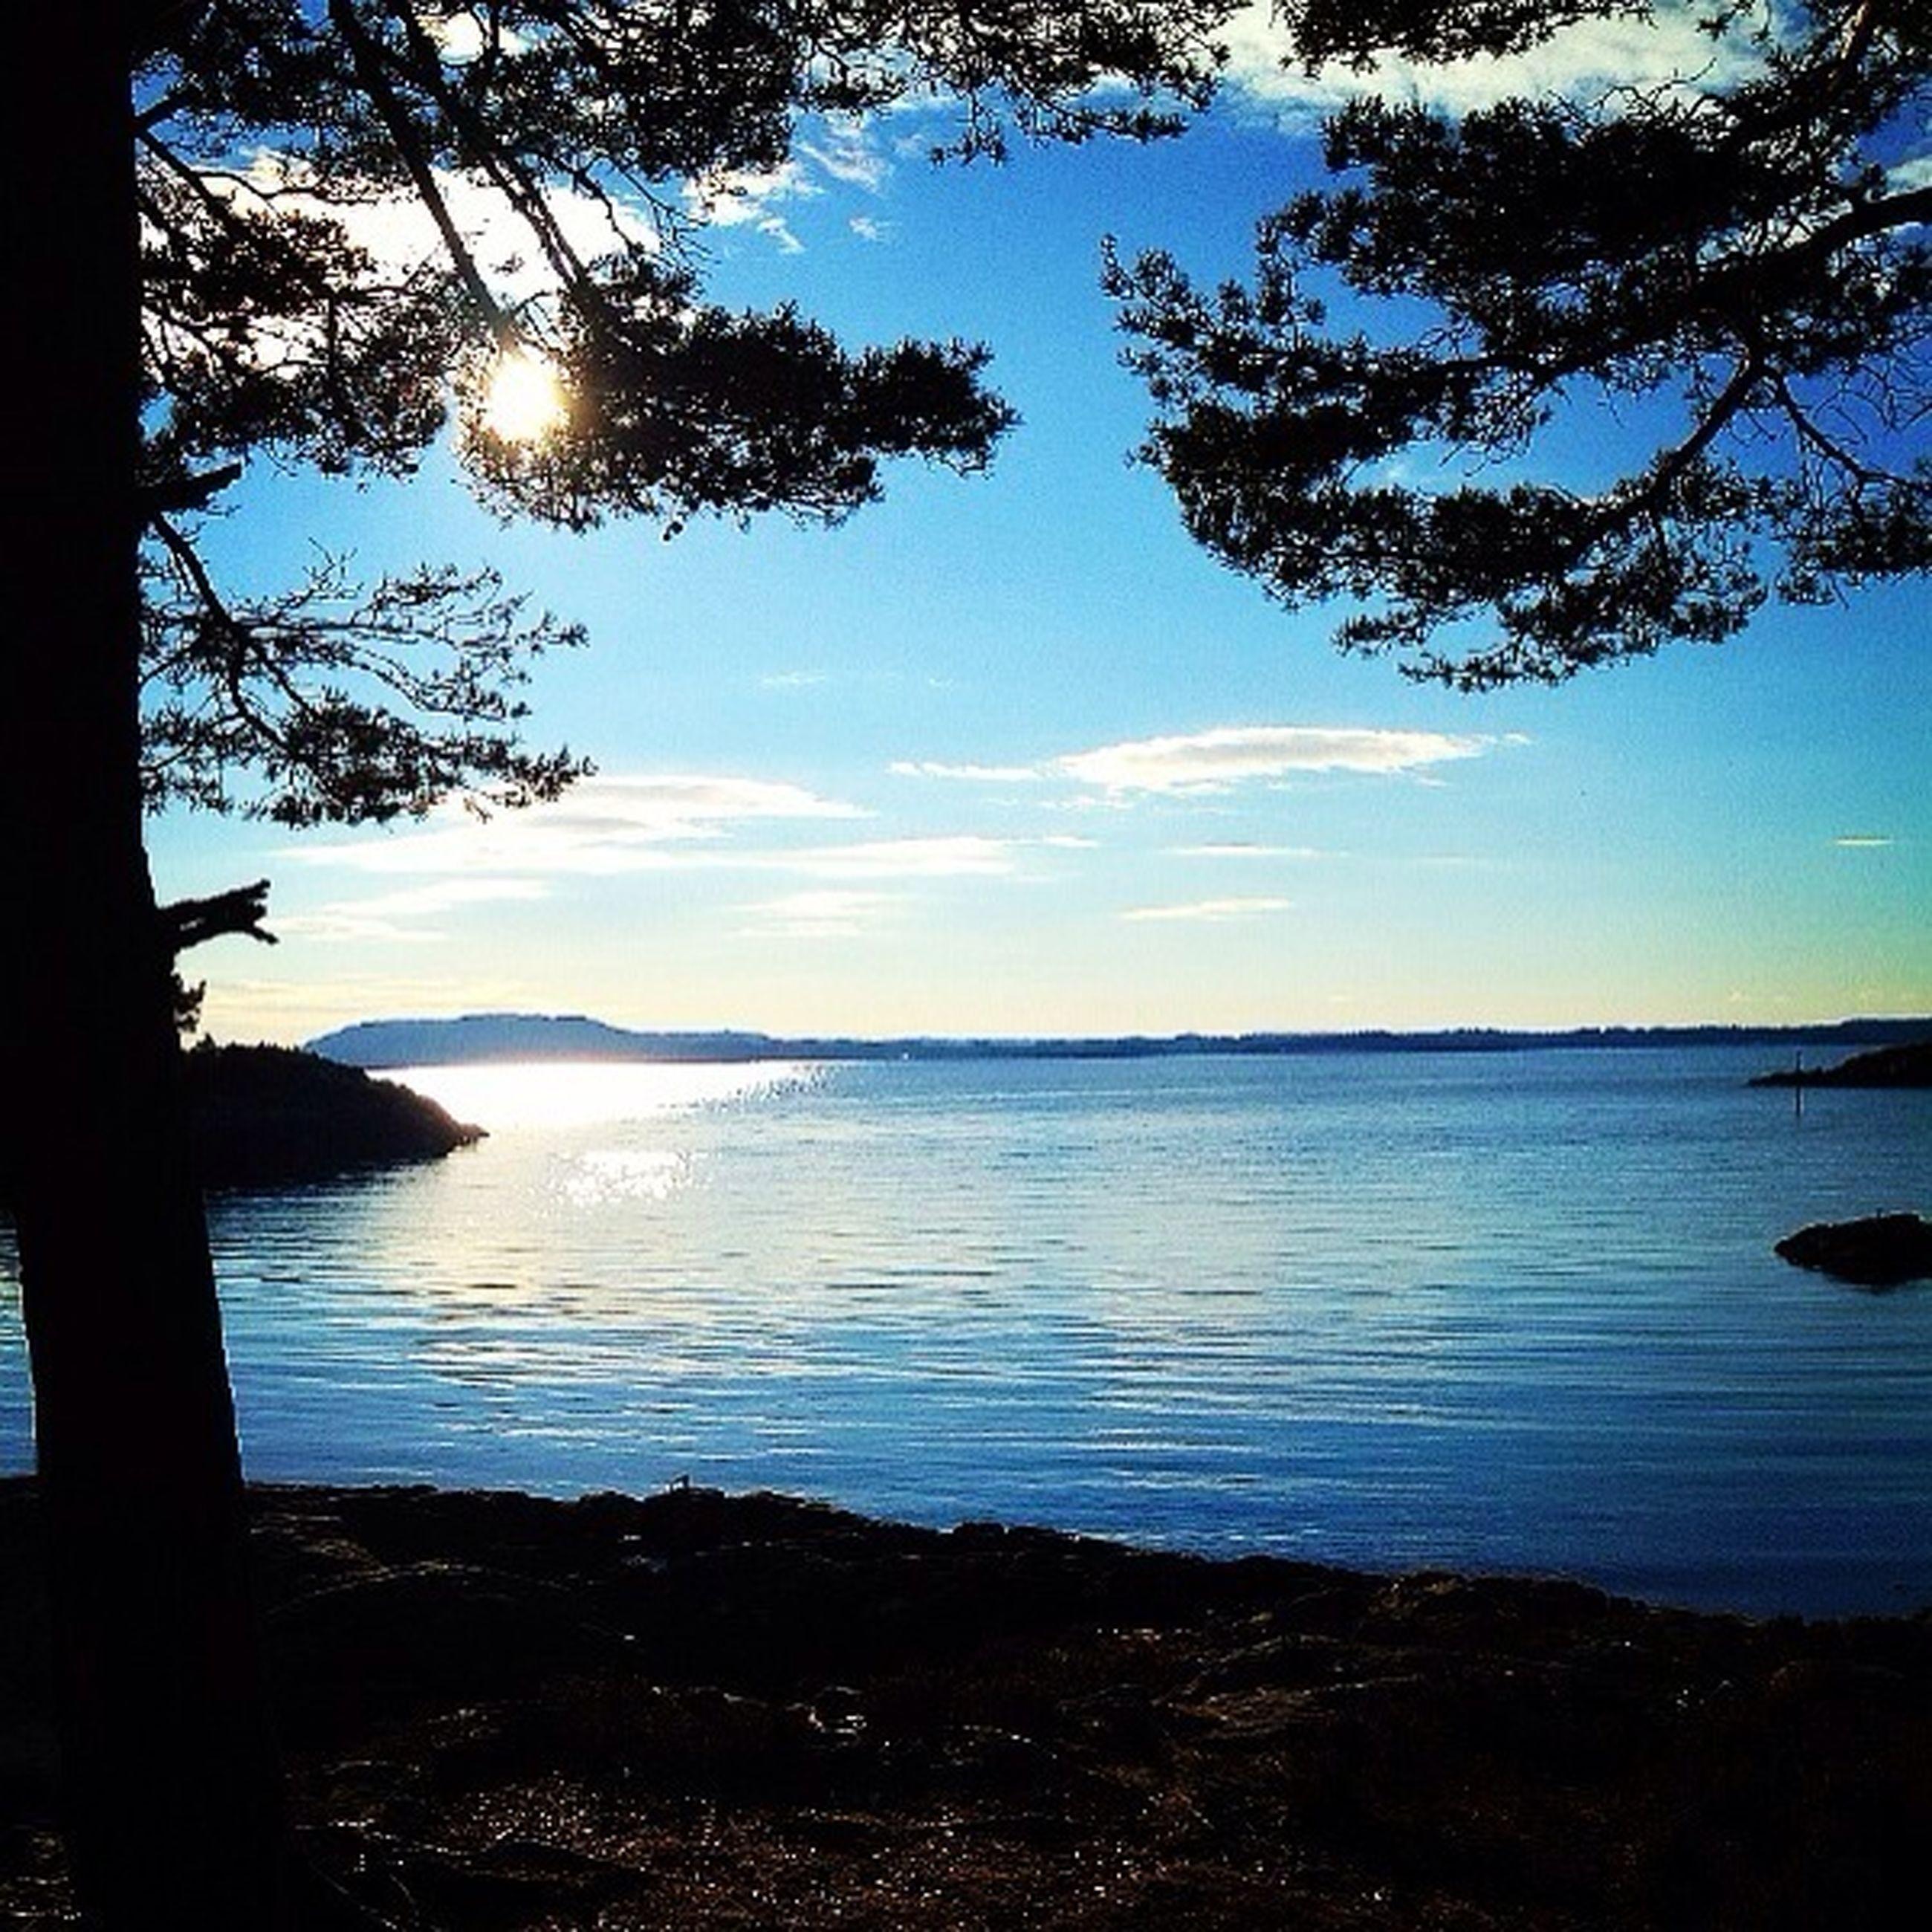 water, tranquil scene, tranquility, scenics, beauty in nature, sky, sea, tree, lake, nature, sun, reflection, sunlight, idyllic, horizon over water, silhouette, shore, calm, blue, lakeshore